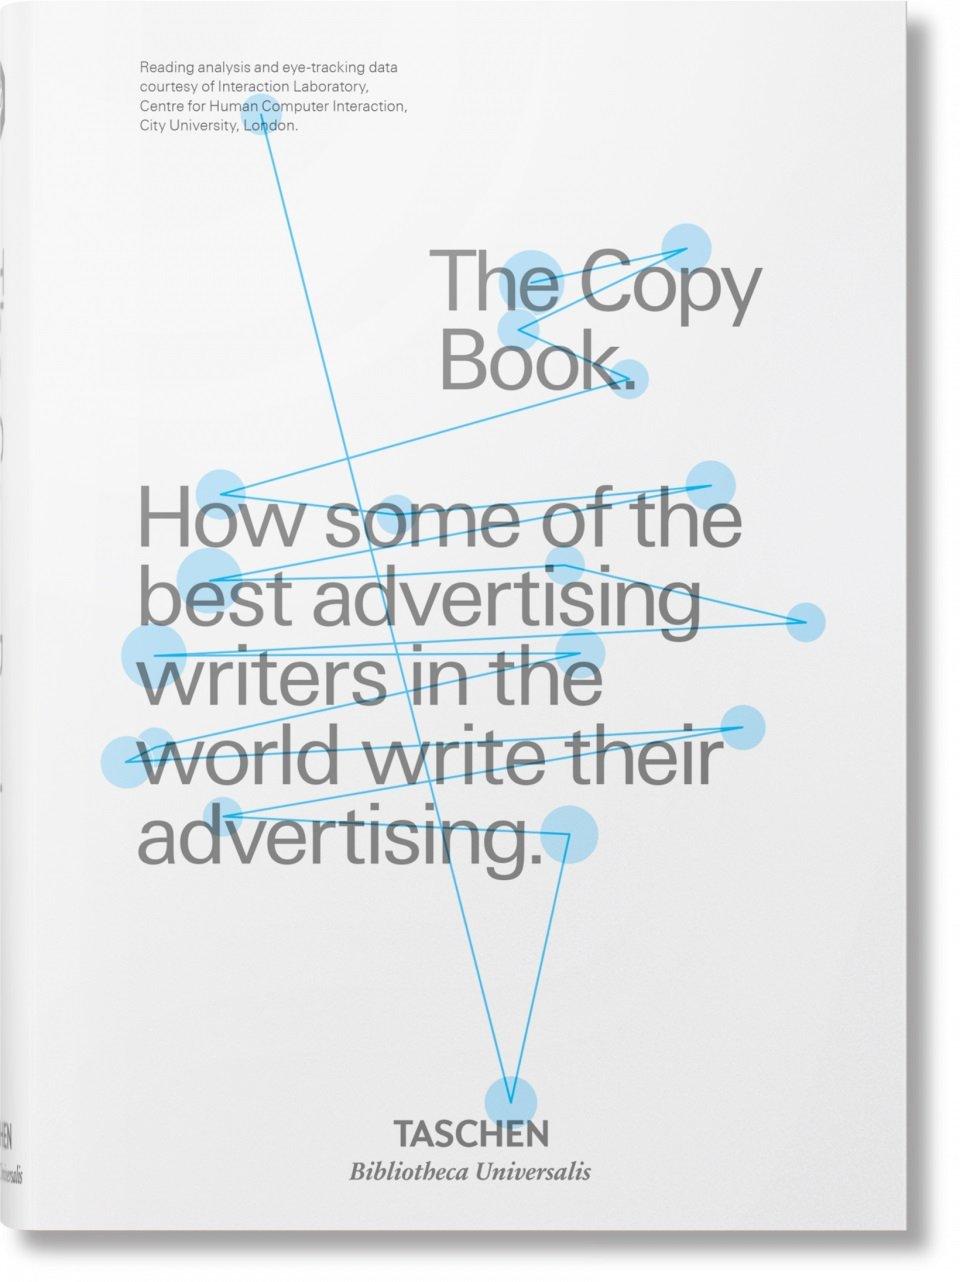 D&AD The Copy Book (Anglais) Relié – 20 avril 2018 D&aD D&aD EVERGREEN 3836568527 Art